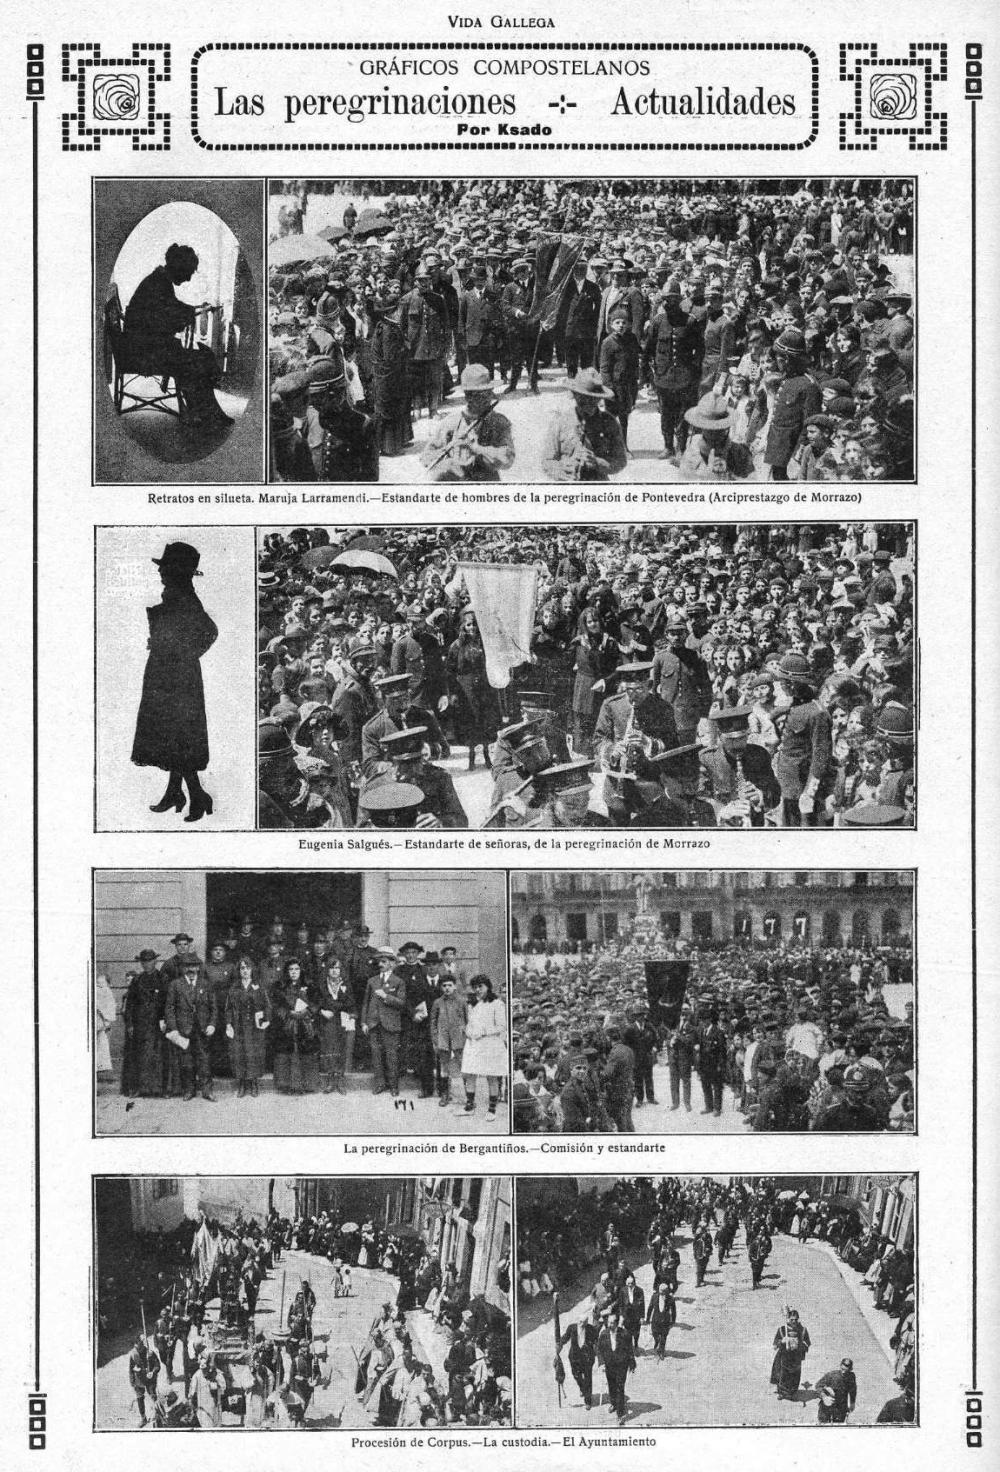 1920. Vida Gallega. PeregrinacionBergantiños